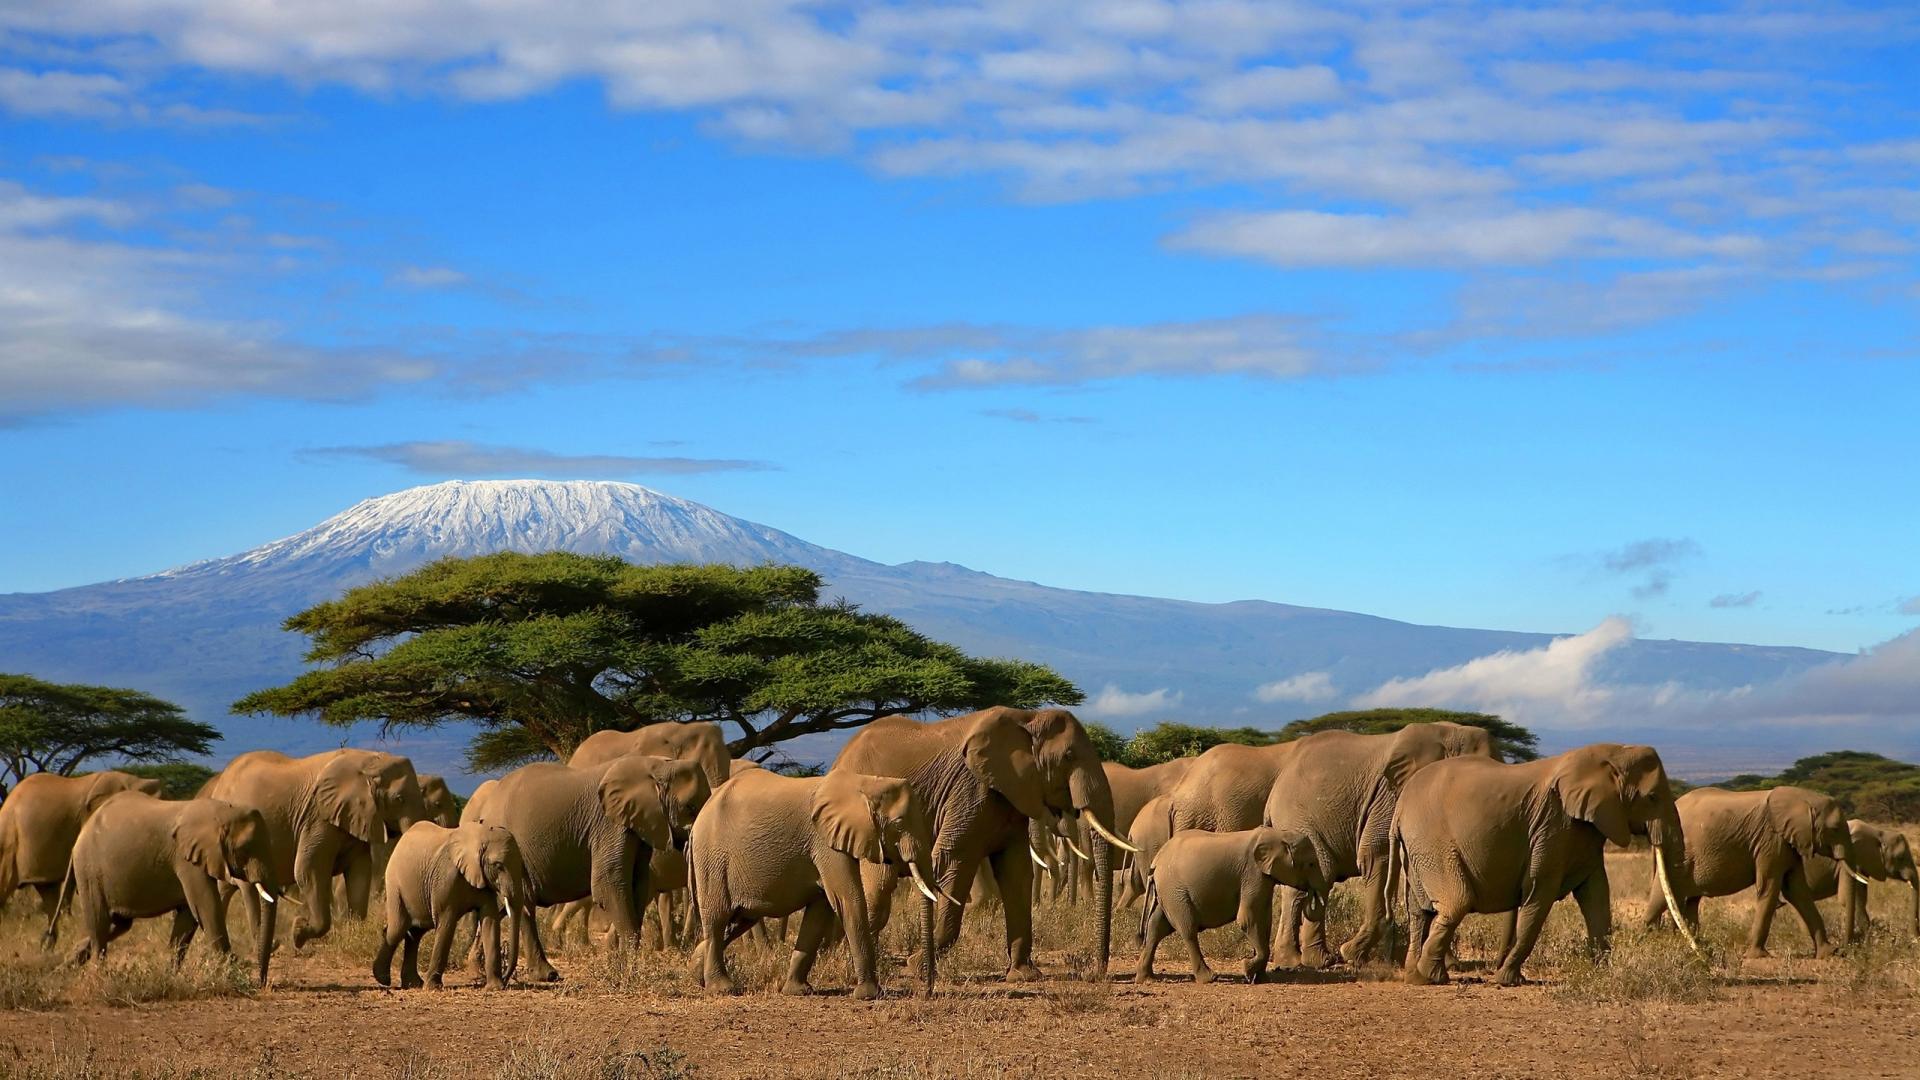 gorgeous herd wallpaper 42798